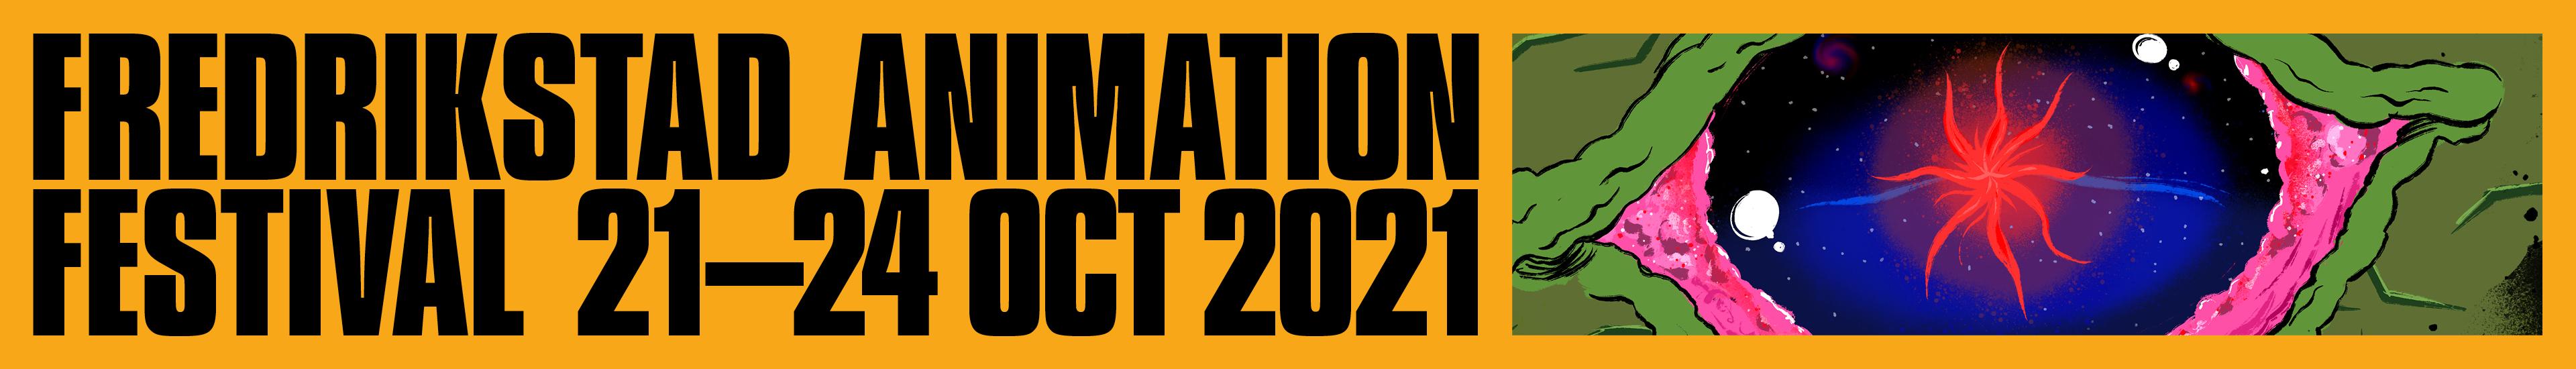 Fredrikstad Animation Festival 2021